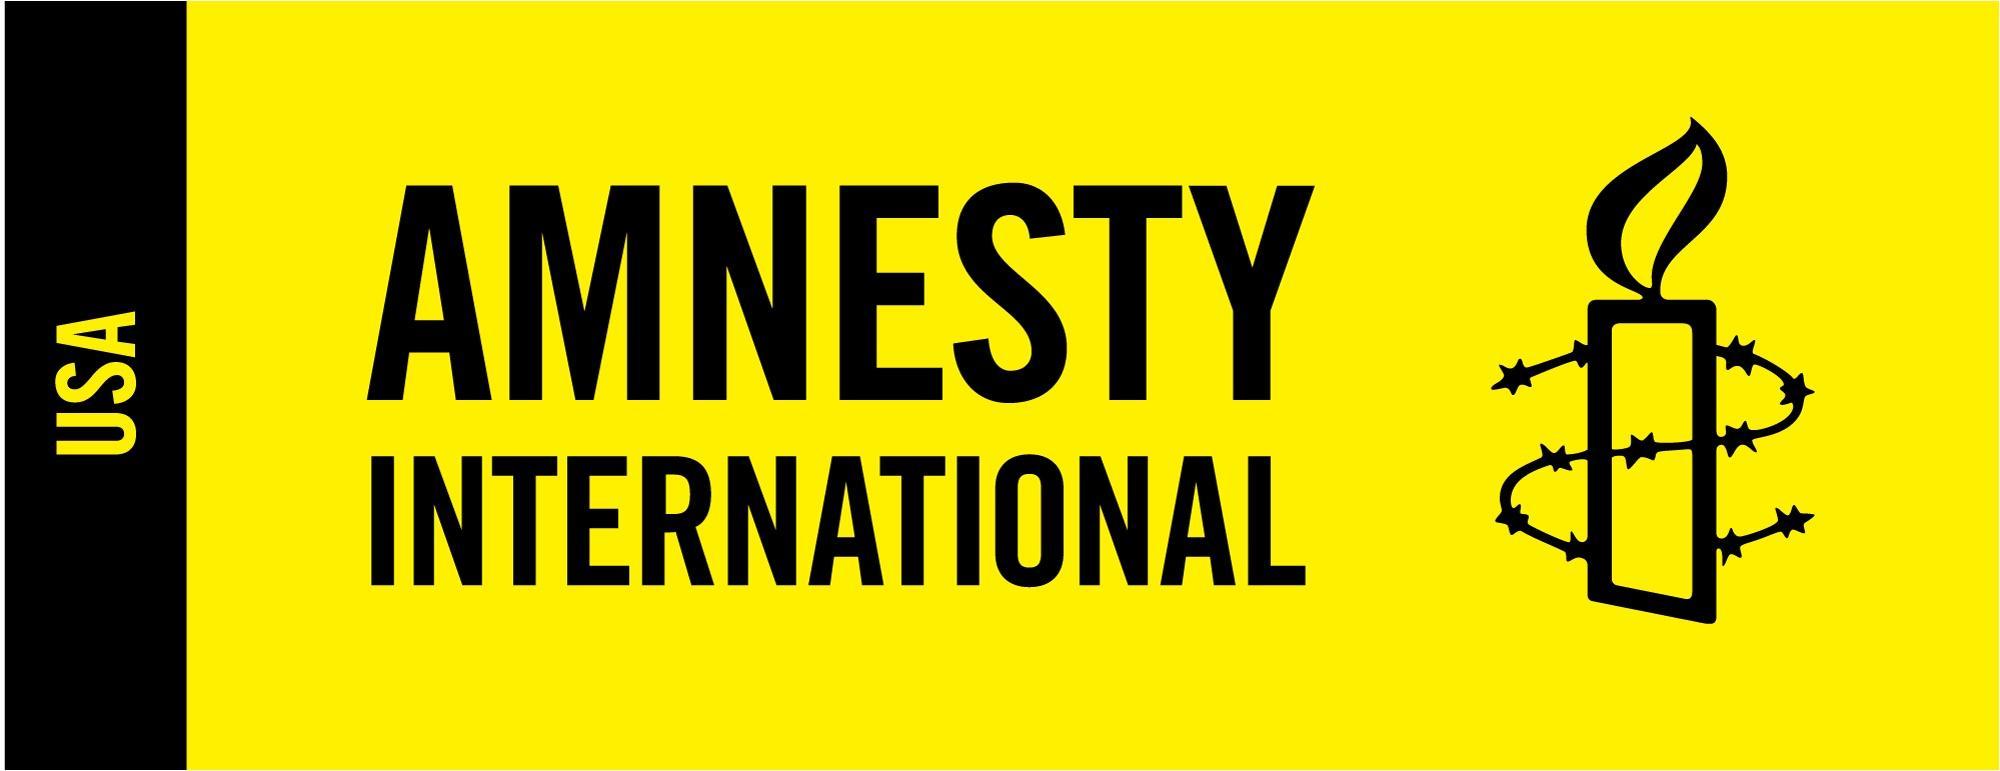 1st Amnesty International Asheville Group Mee